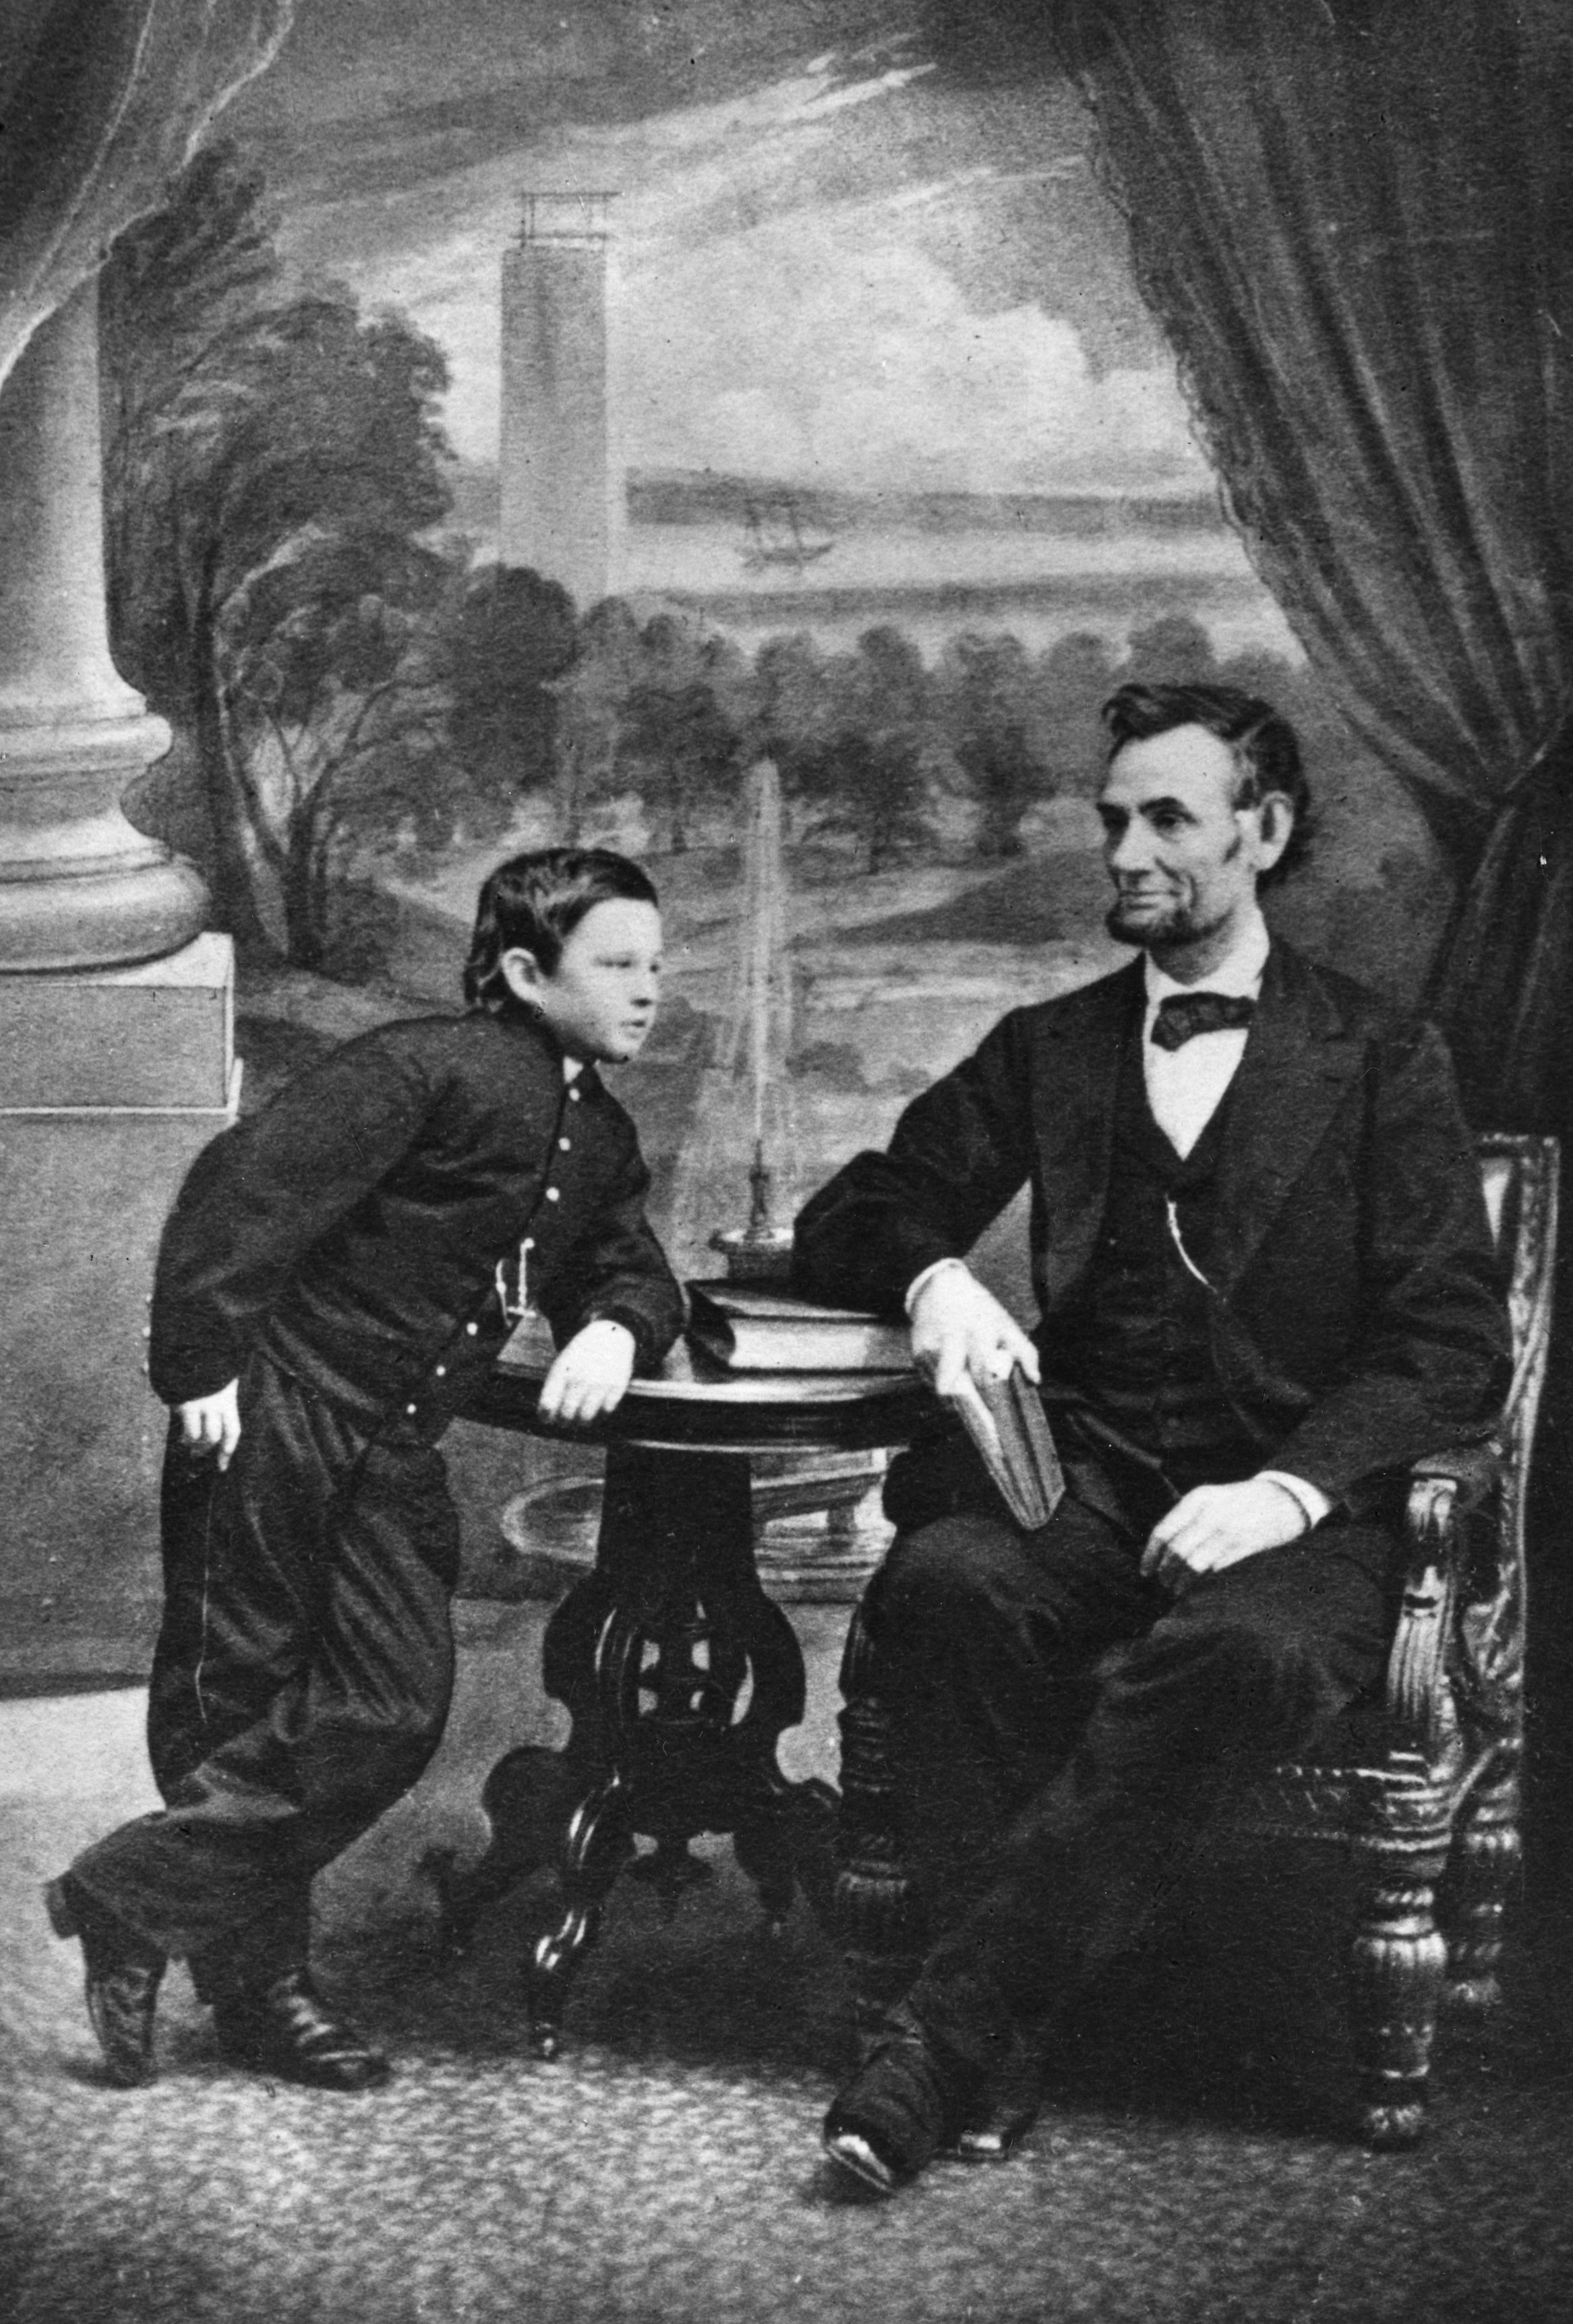 Abraham Lincoln and his son Thomas